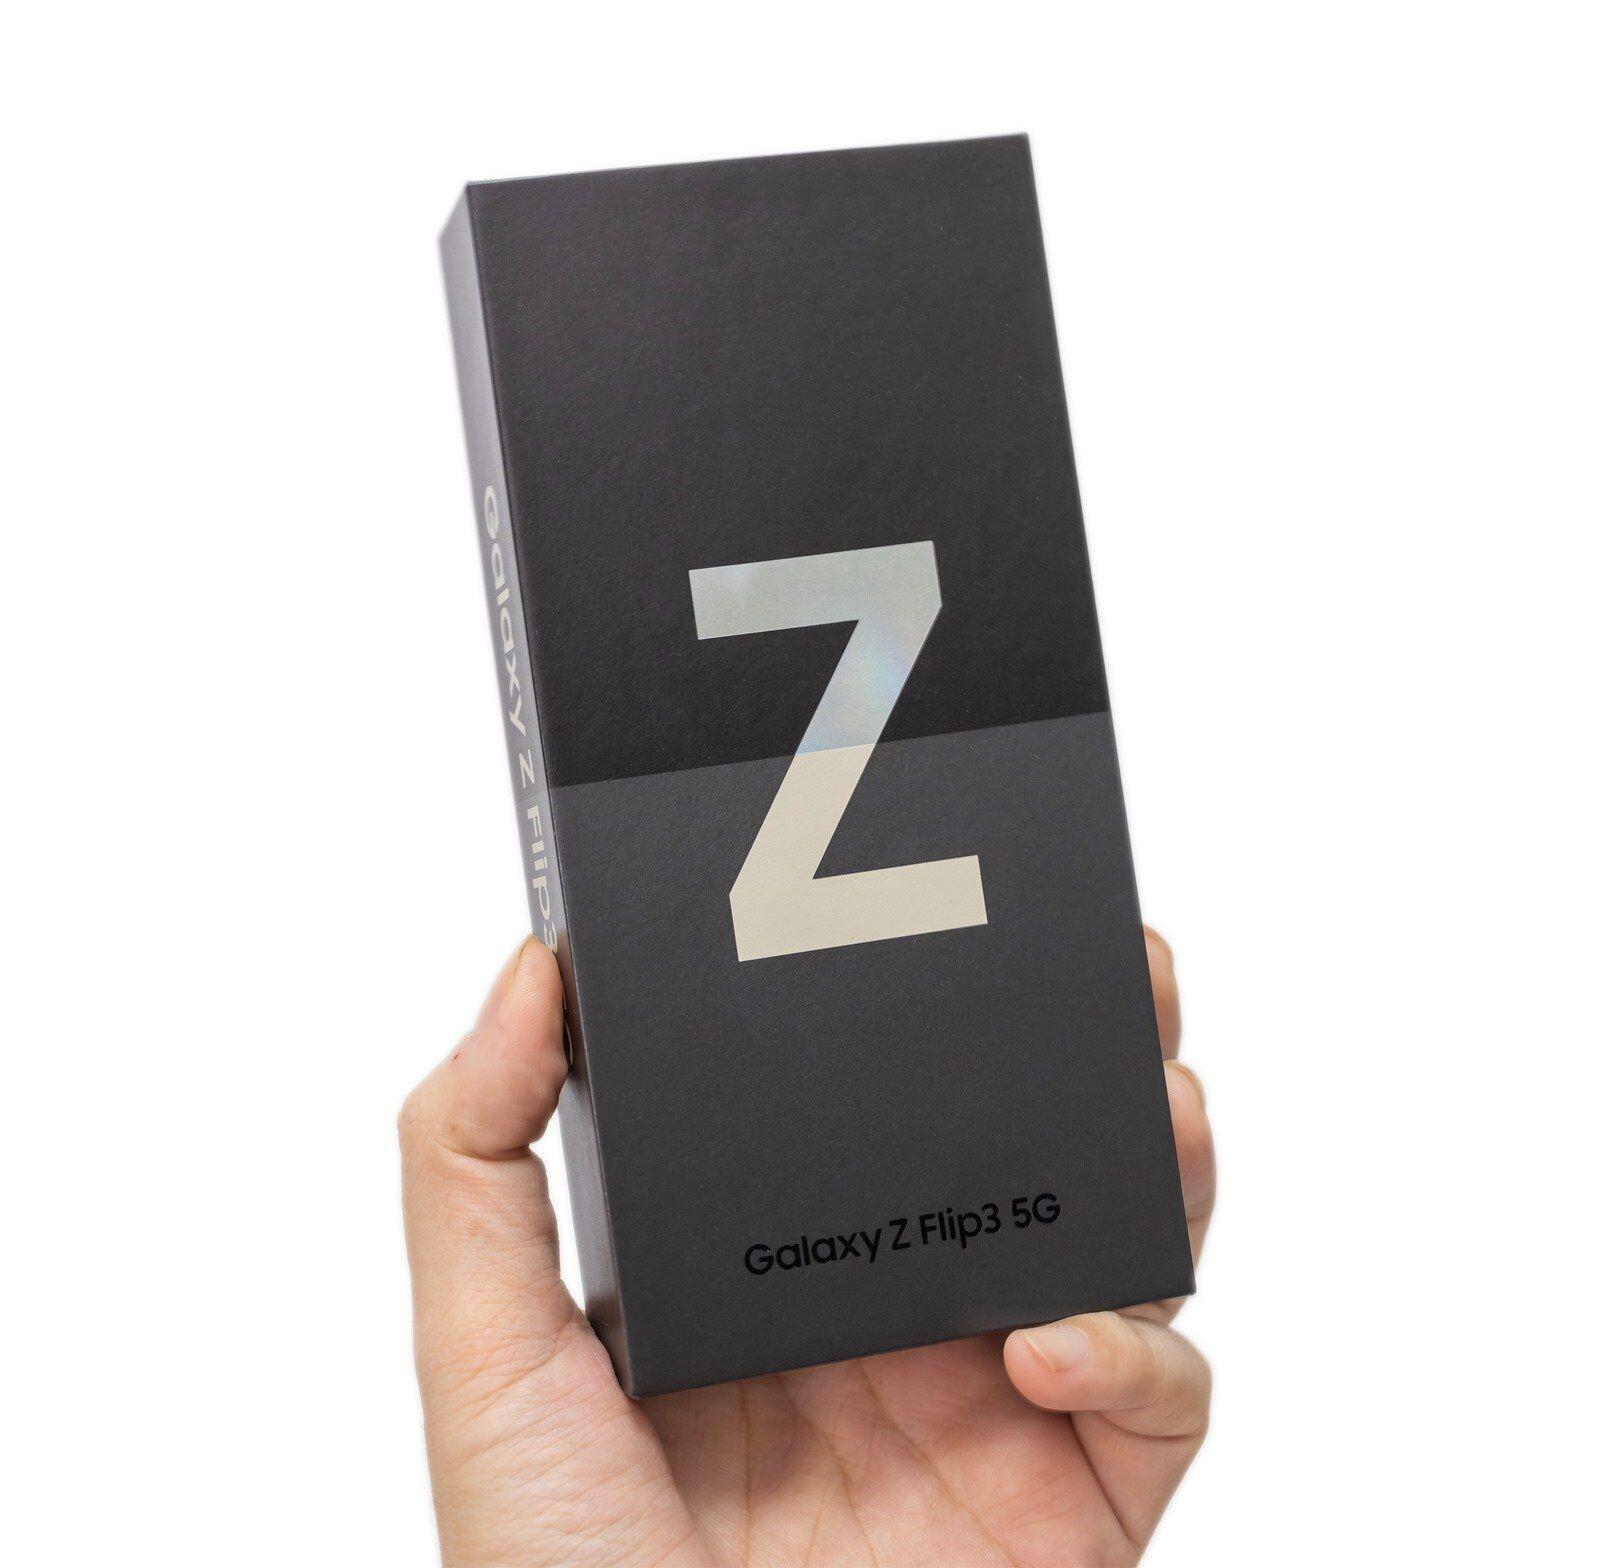 Z Flip 3 最美折疊機顏值真的高 (1) 看看性能電力表現如何! @3C 達人廖阿輝